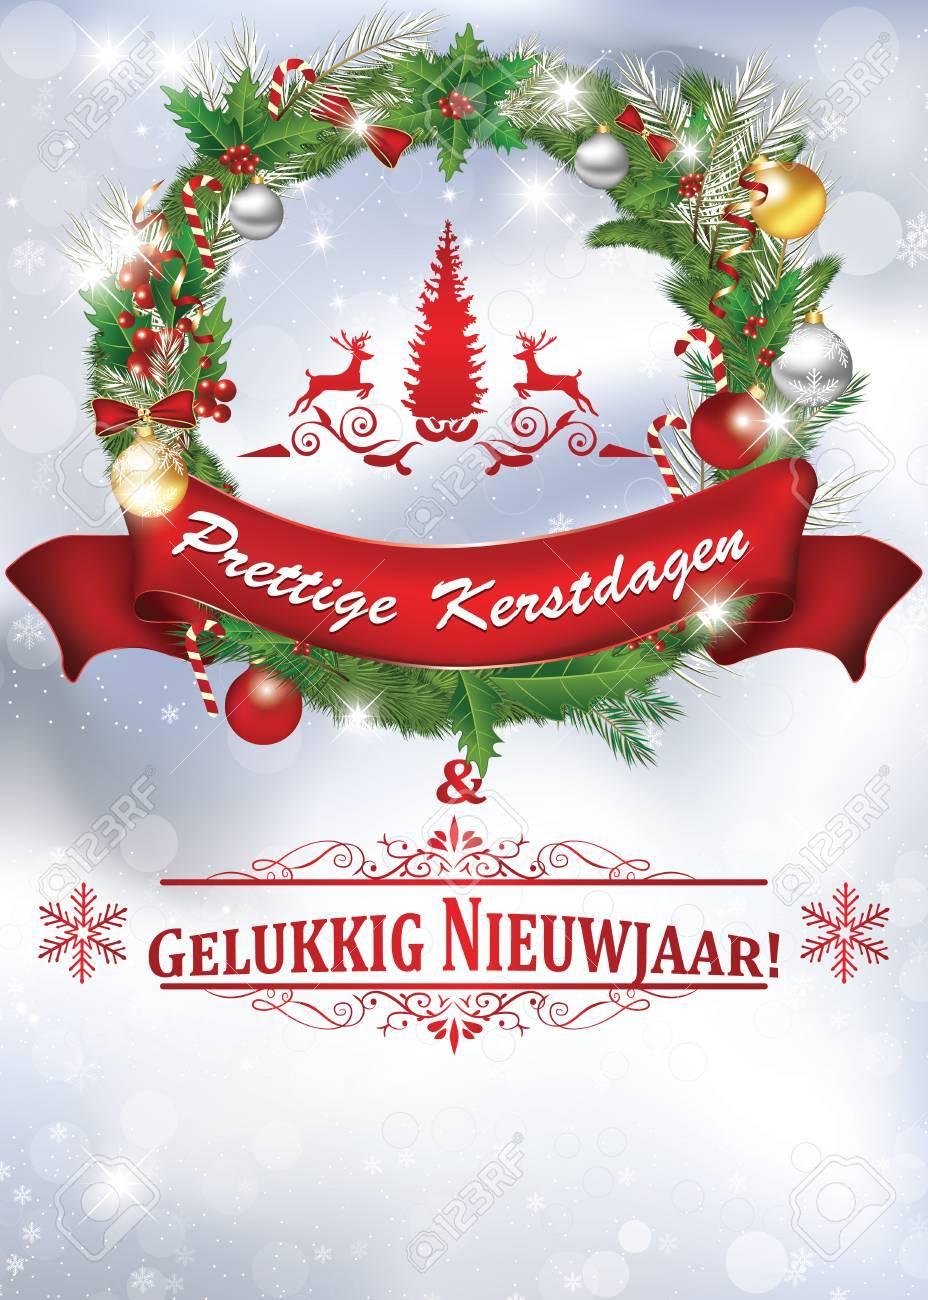 Merry Christmas In Dutch.Merry Christmas And Happy New Year Dutch Language Fijne Kerstdagen